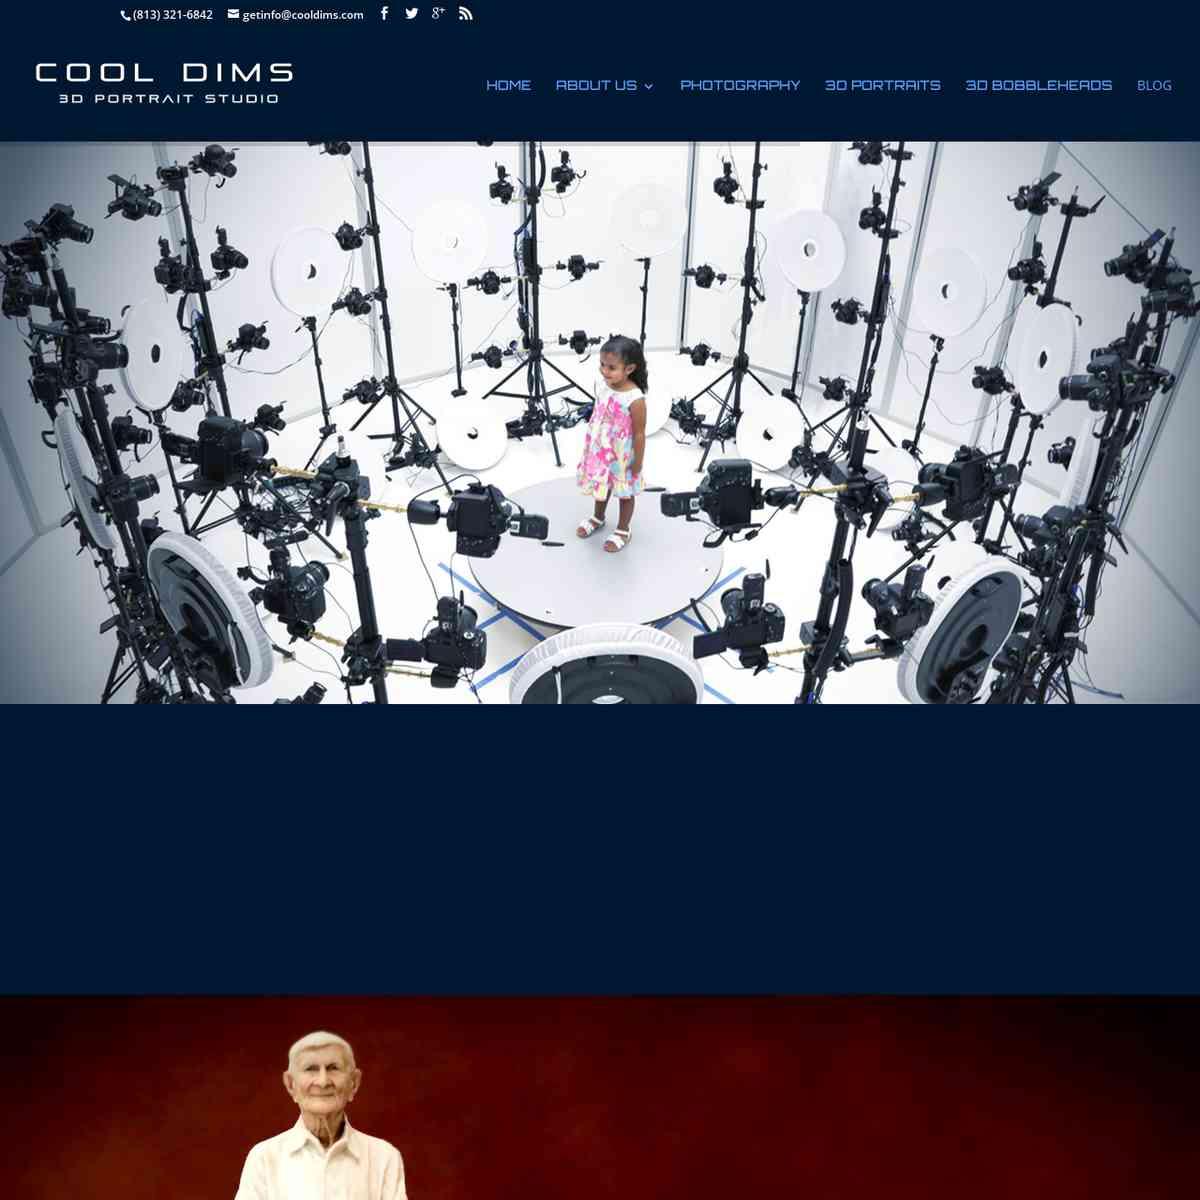 cooldims.com